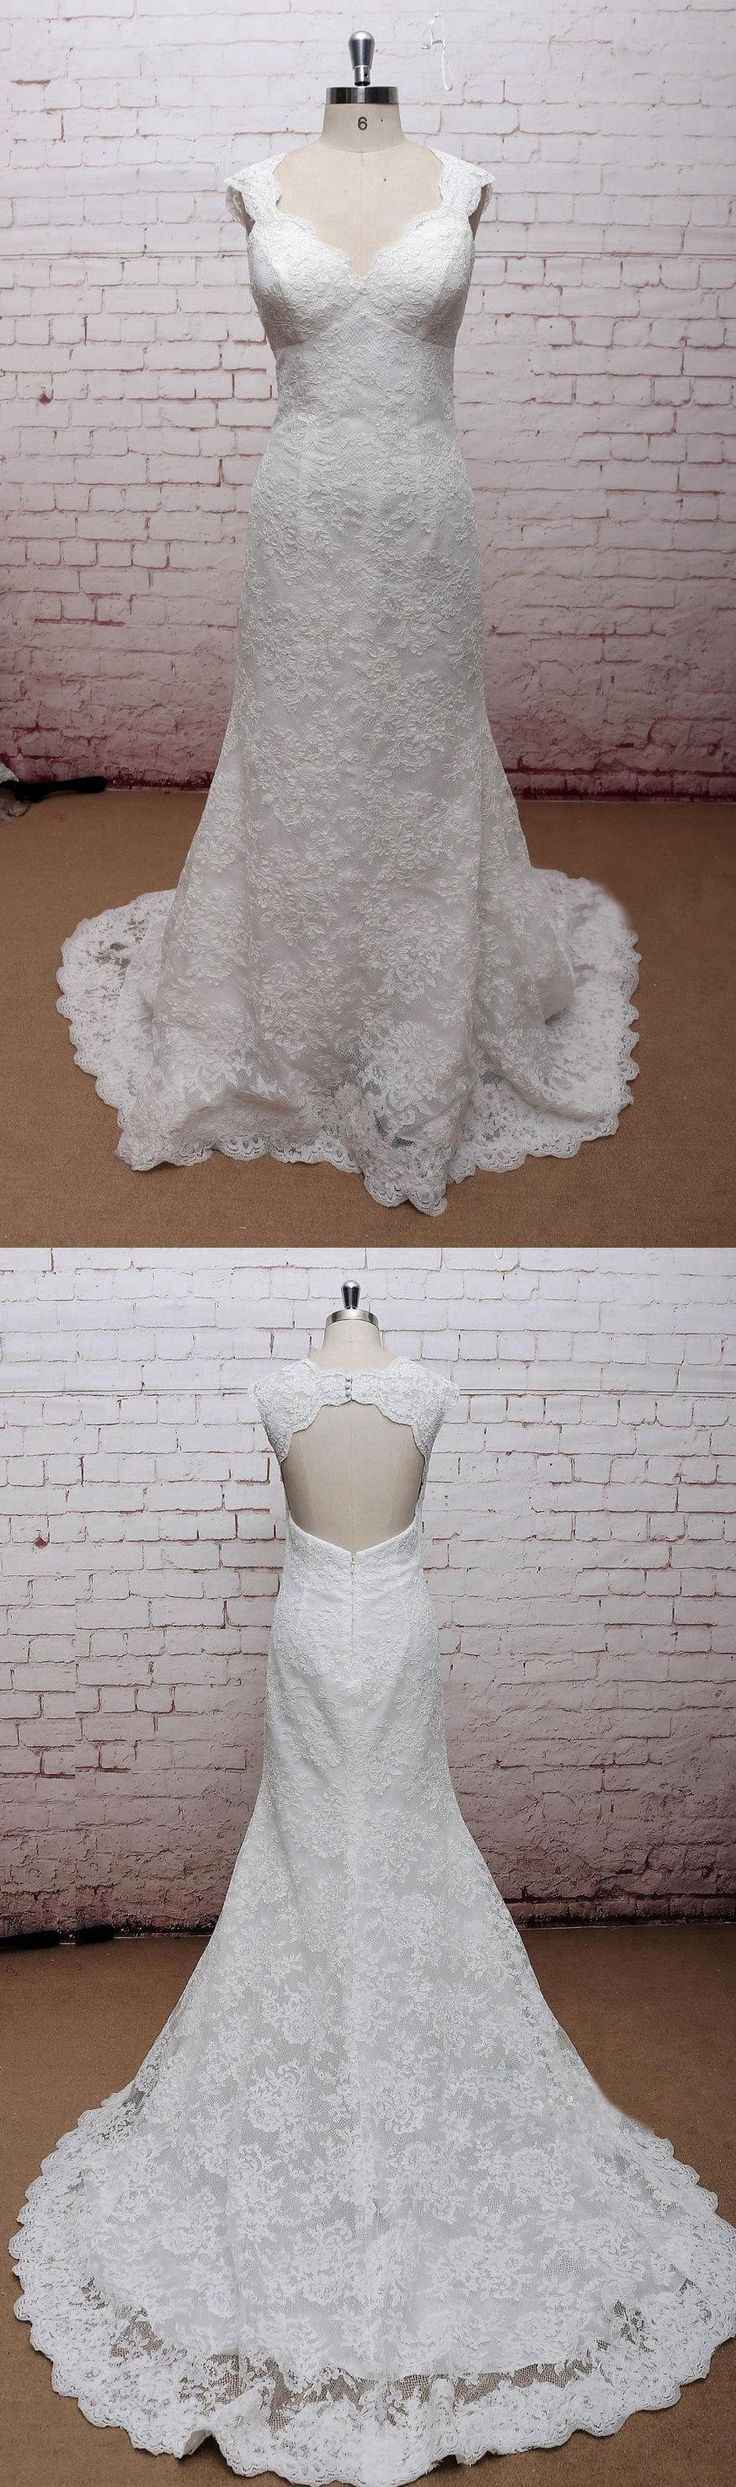 Wedding dress dry cleaning near me   best Wedding dresses images on Pinterest  Wedding frocks Short